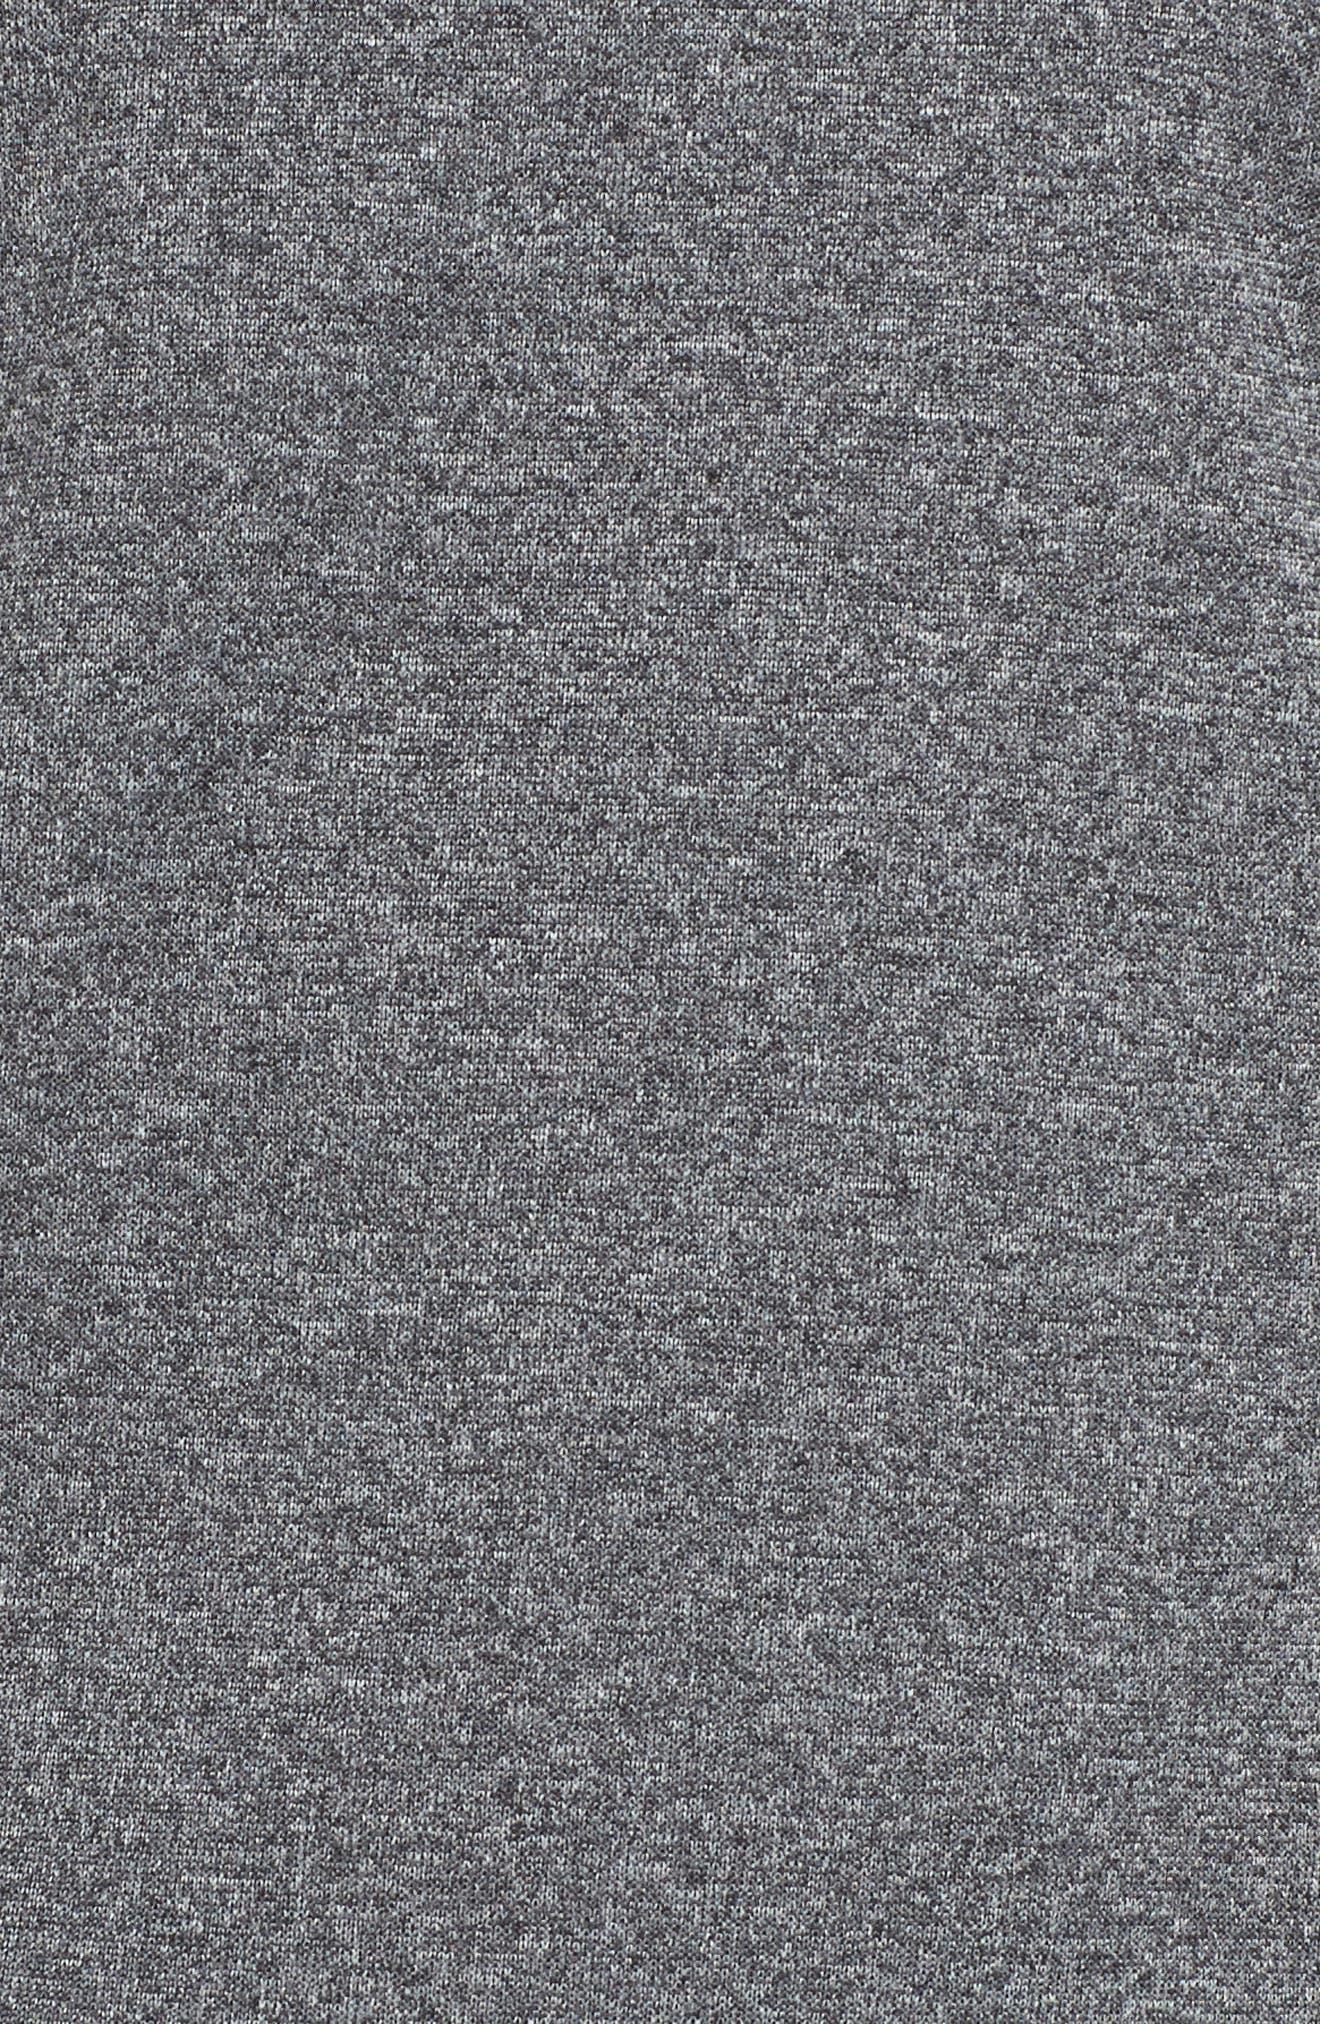 3-Stripes Running Sweatshirt,                             Alternate thumbnail 6, color,                             DARK GREY HEATHER